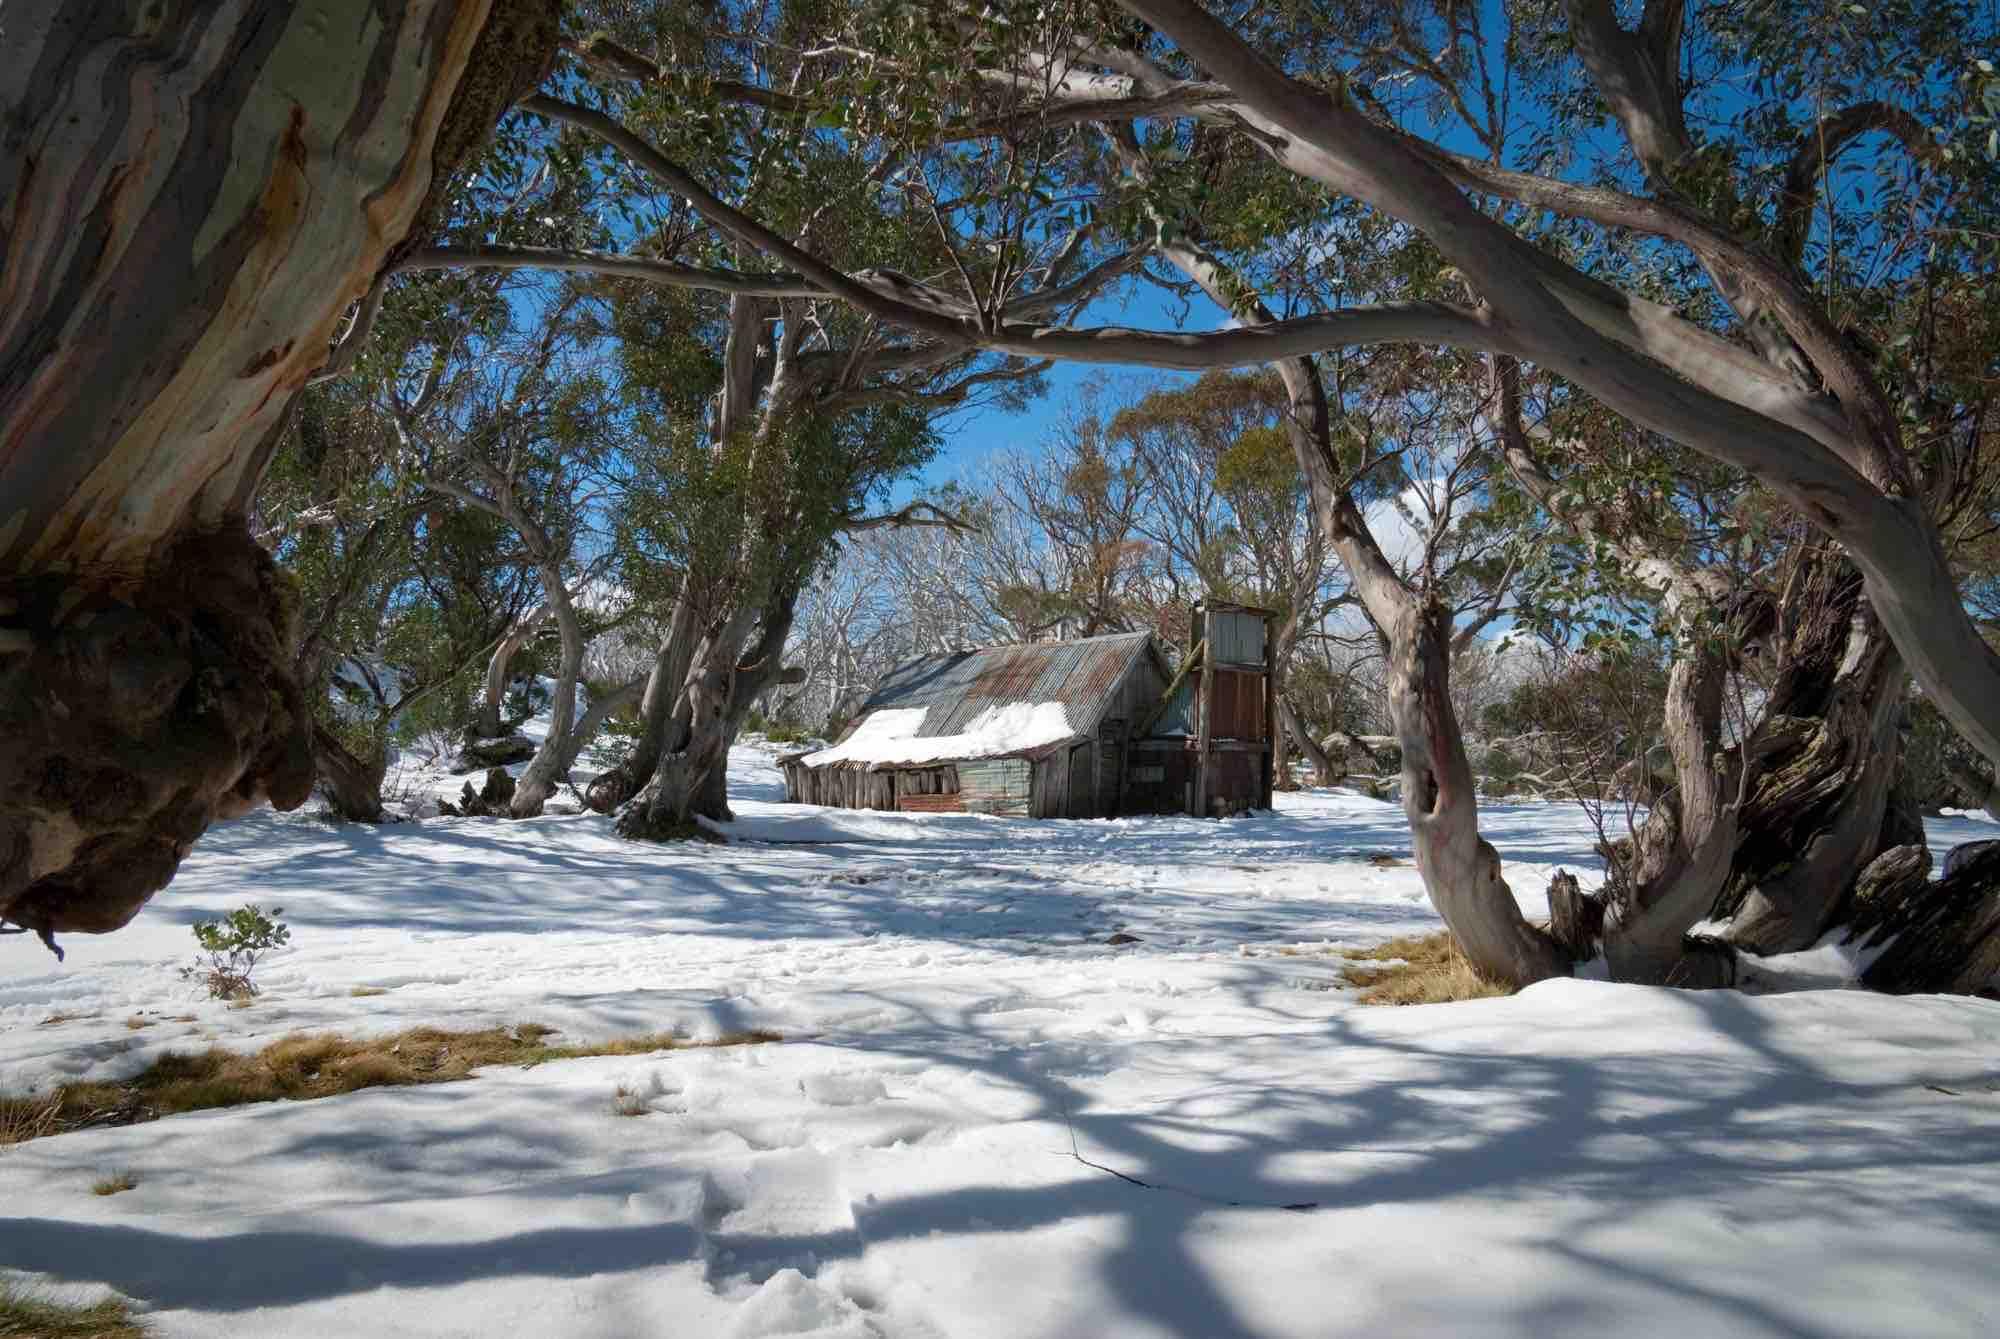 Snow in Australia at an old settler hut on Mt Bogong